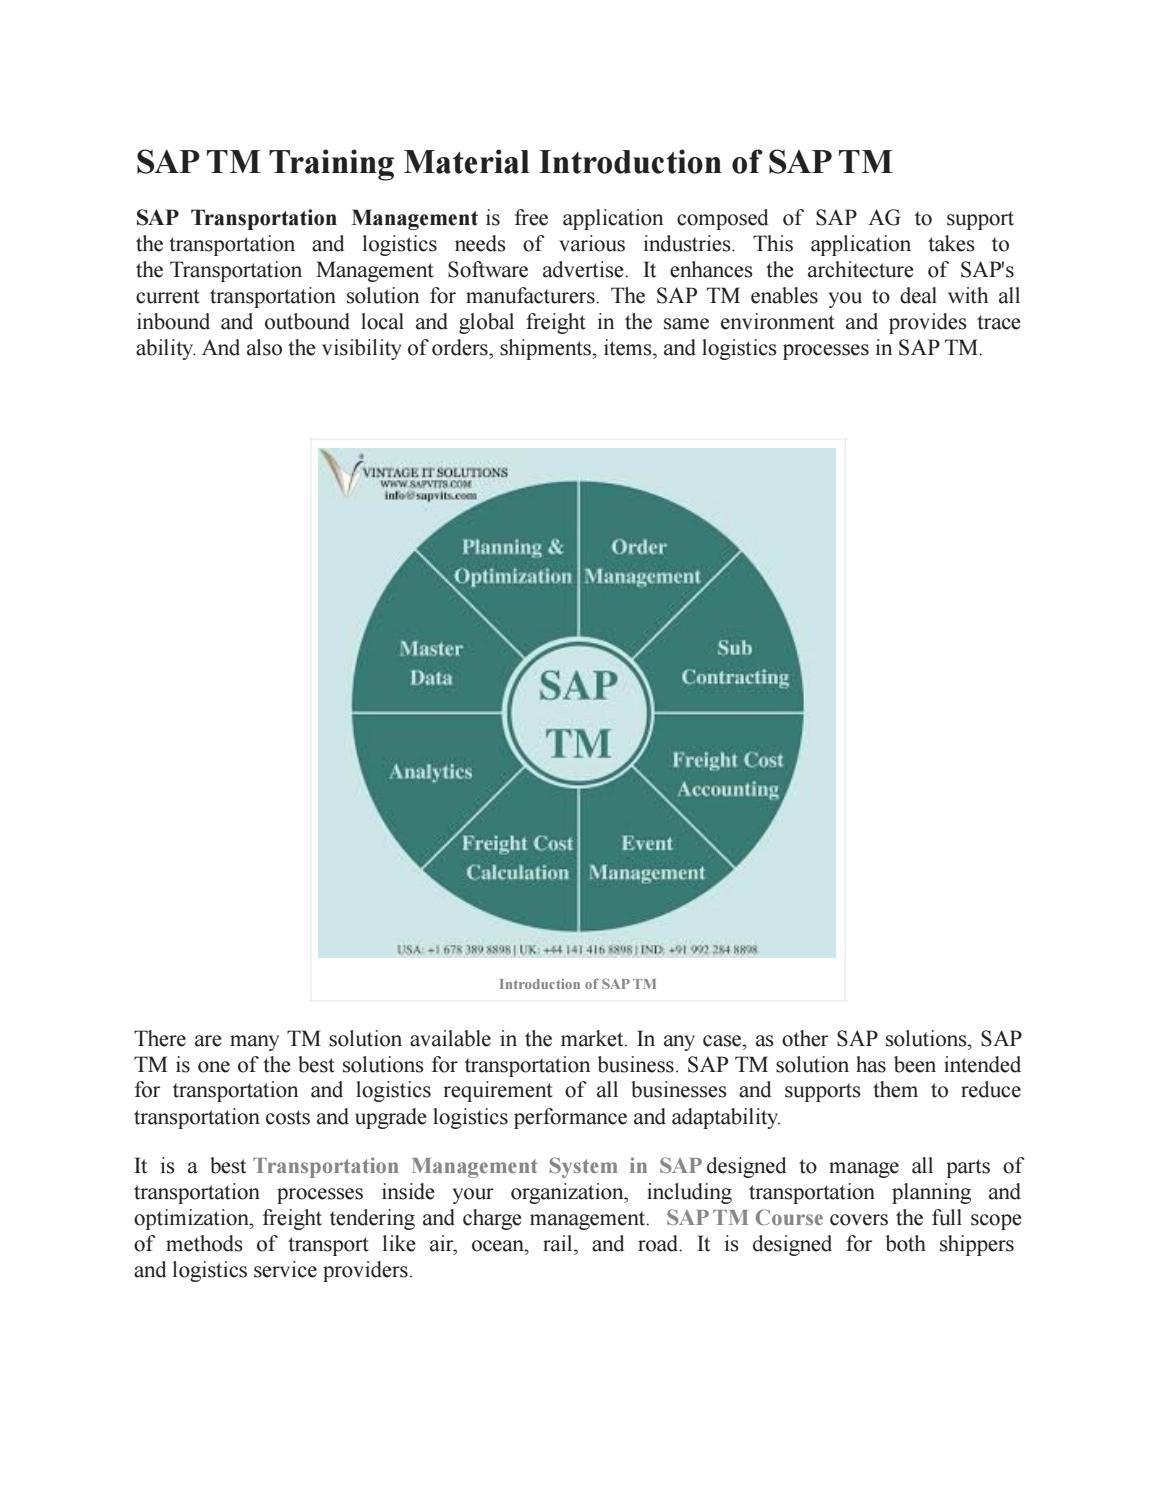 SAP Transportation Management PPT by amrutasapvits - issuu